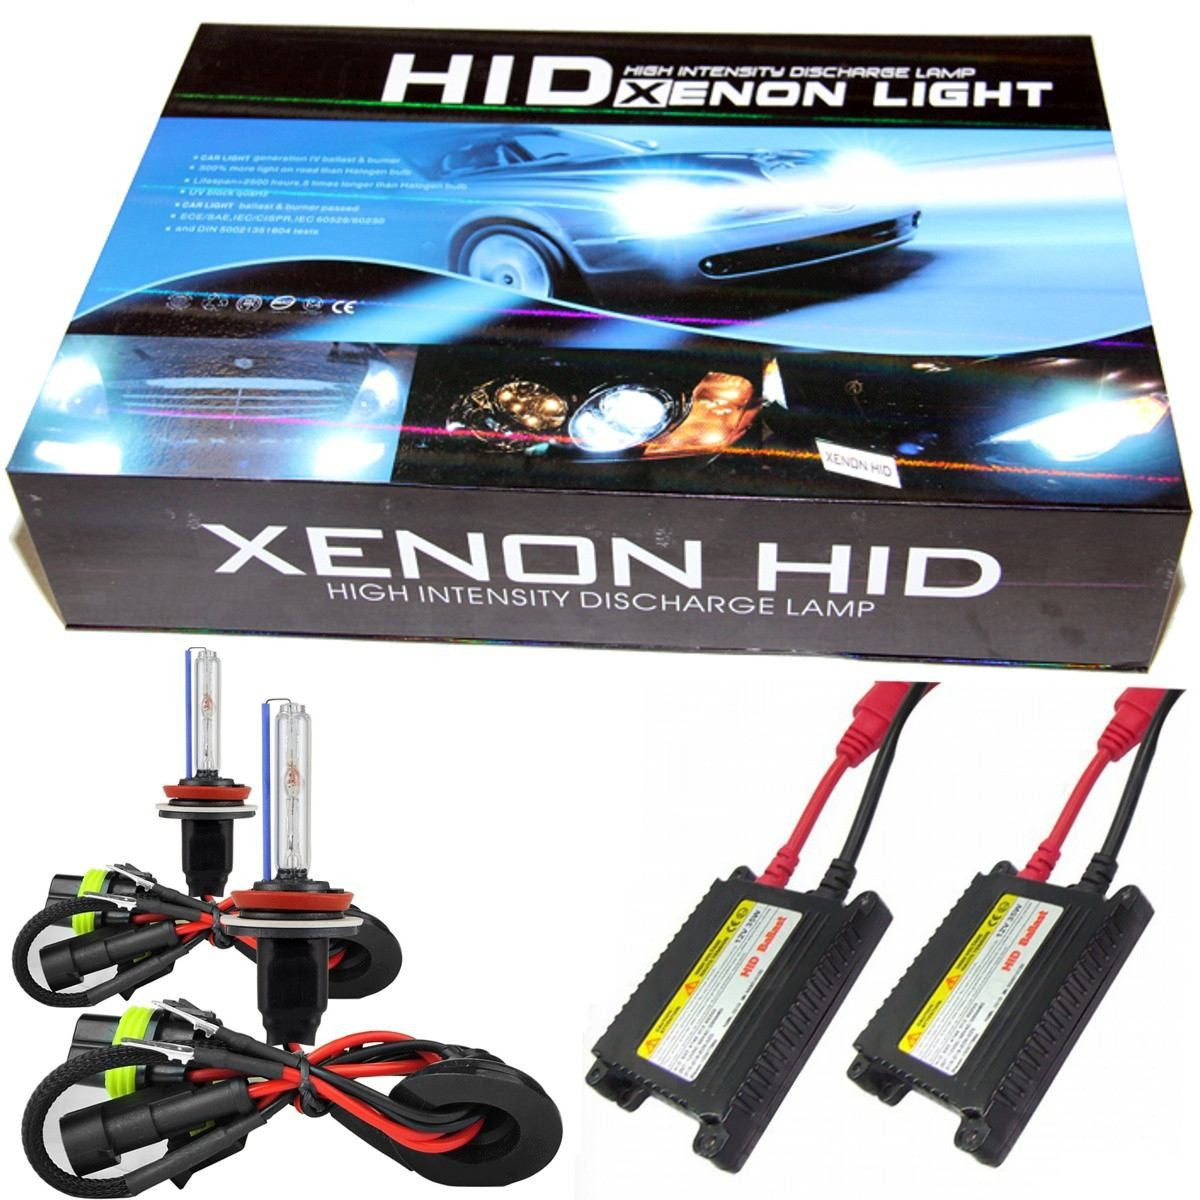 kit xenon hid 4300k 6000k 8000k 10000k h1 h3 h4 h7 h11 hb4. Black Bedroom Furniture Sets. Home Design Ideas